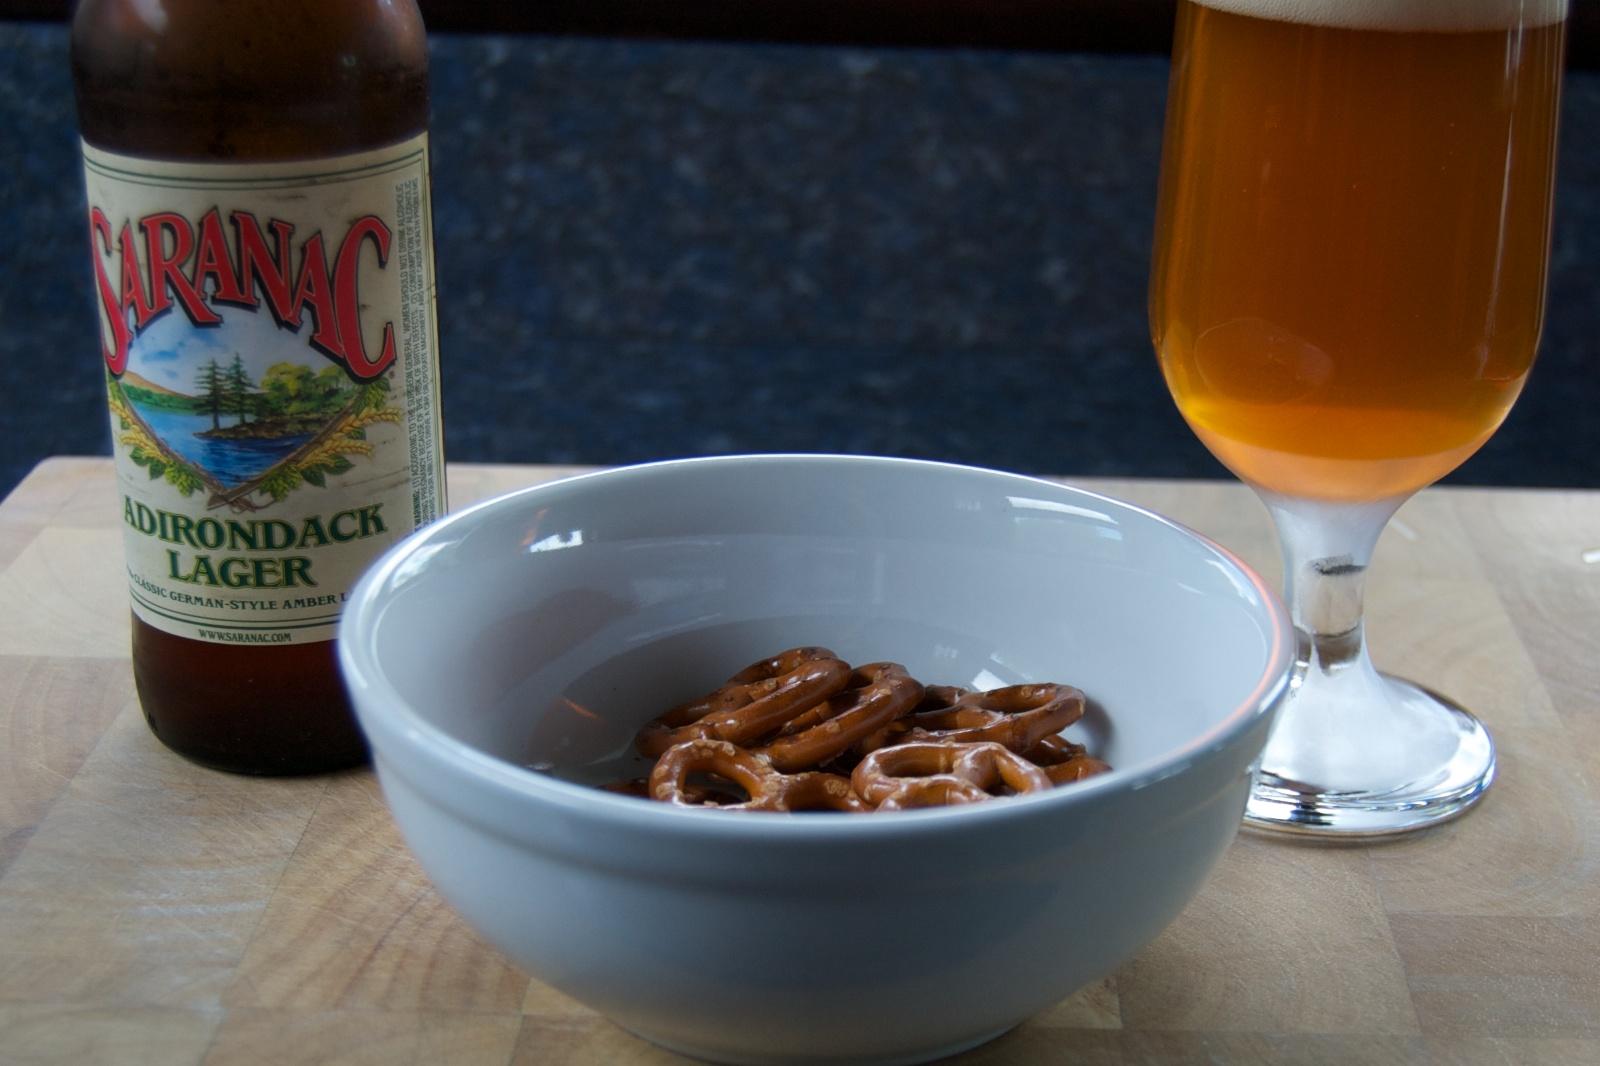 http://blog.rickk.com/food/2012/07/30/ate.2012.07.30.s1.jpg